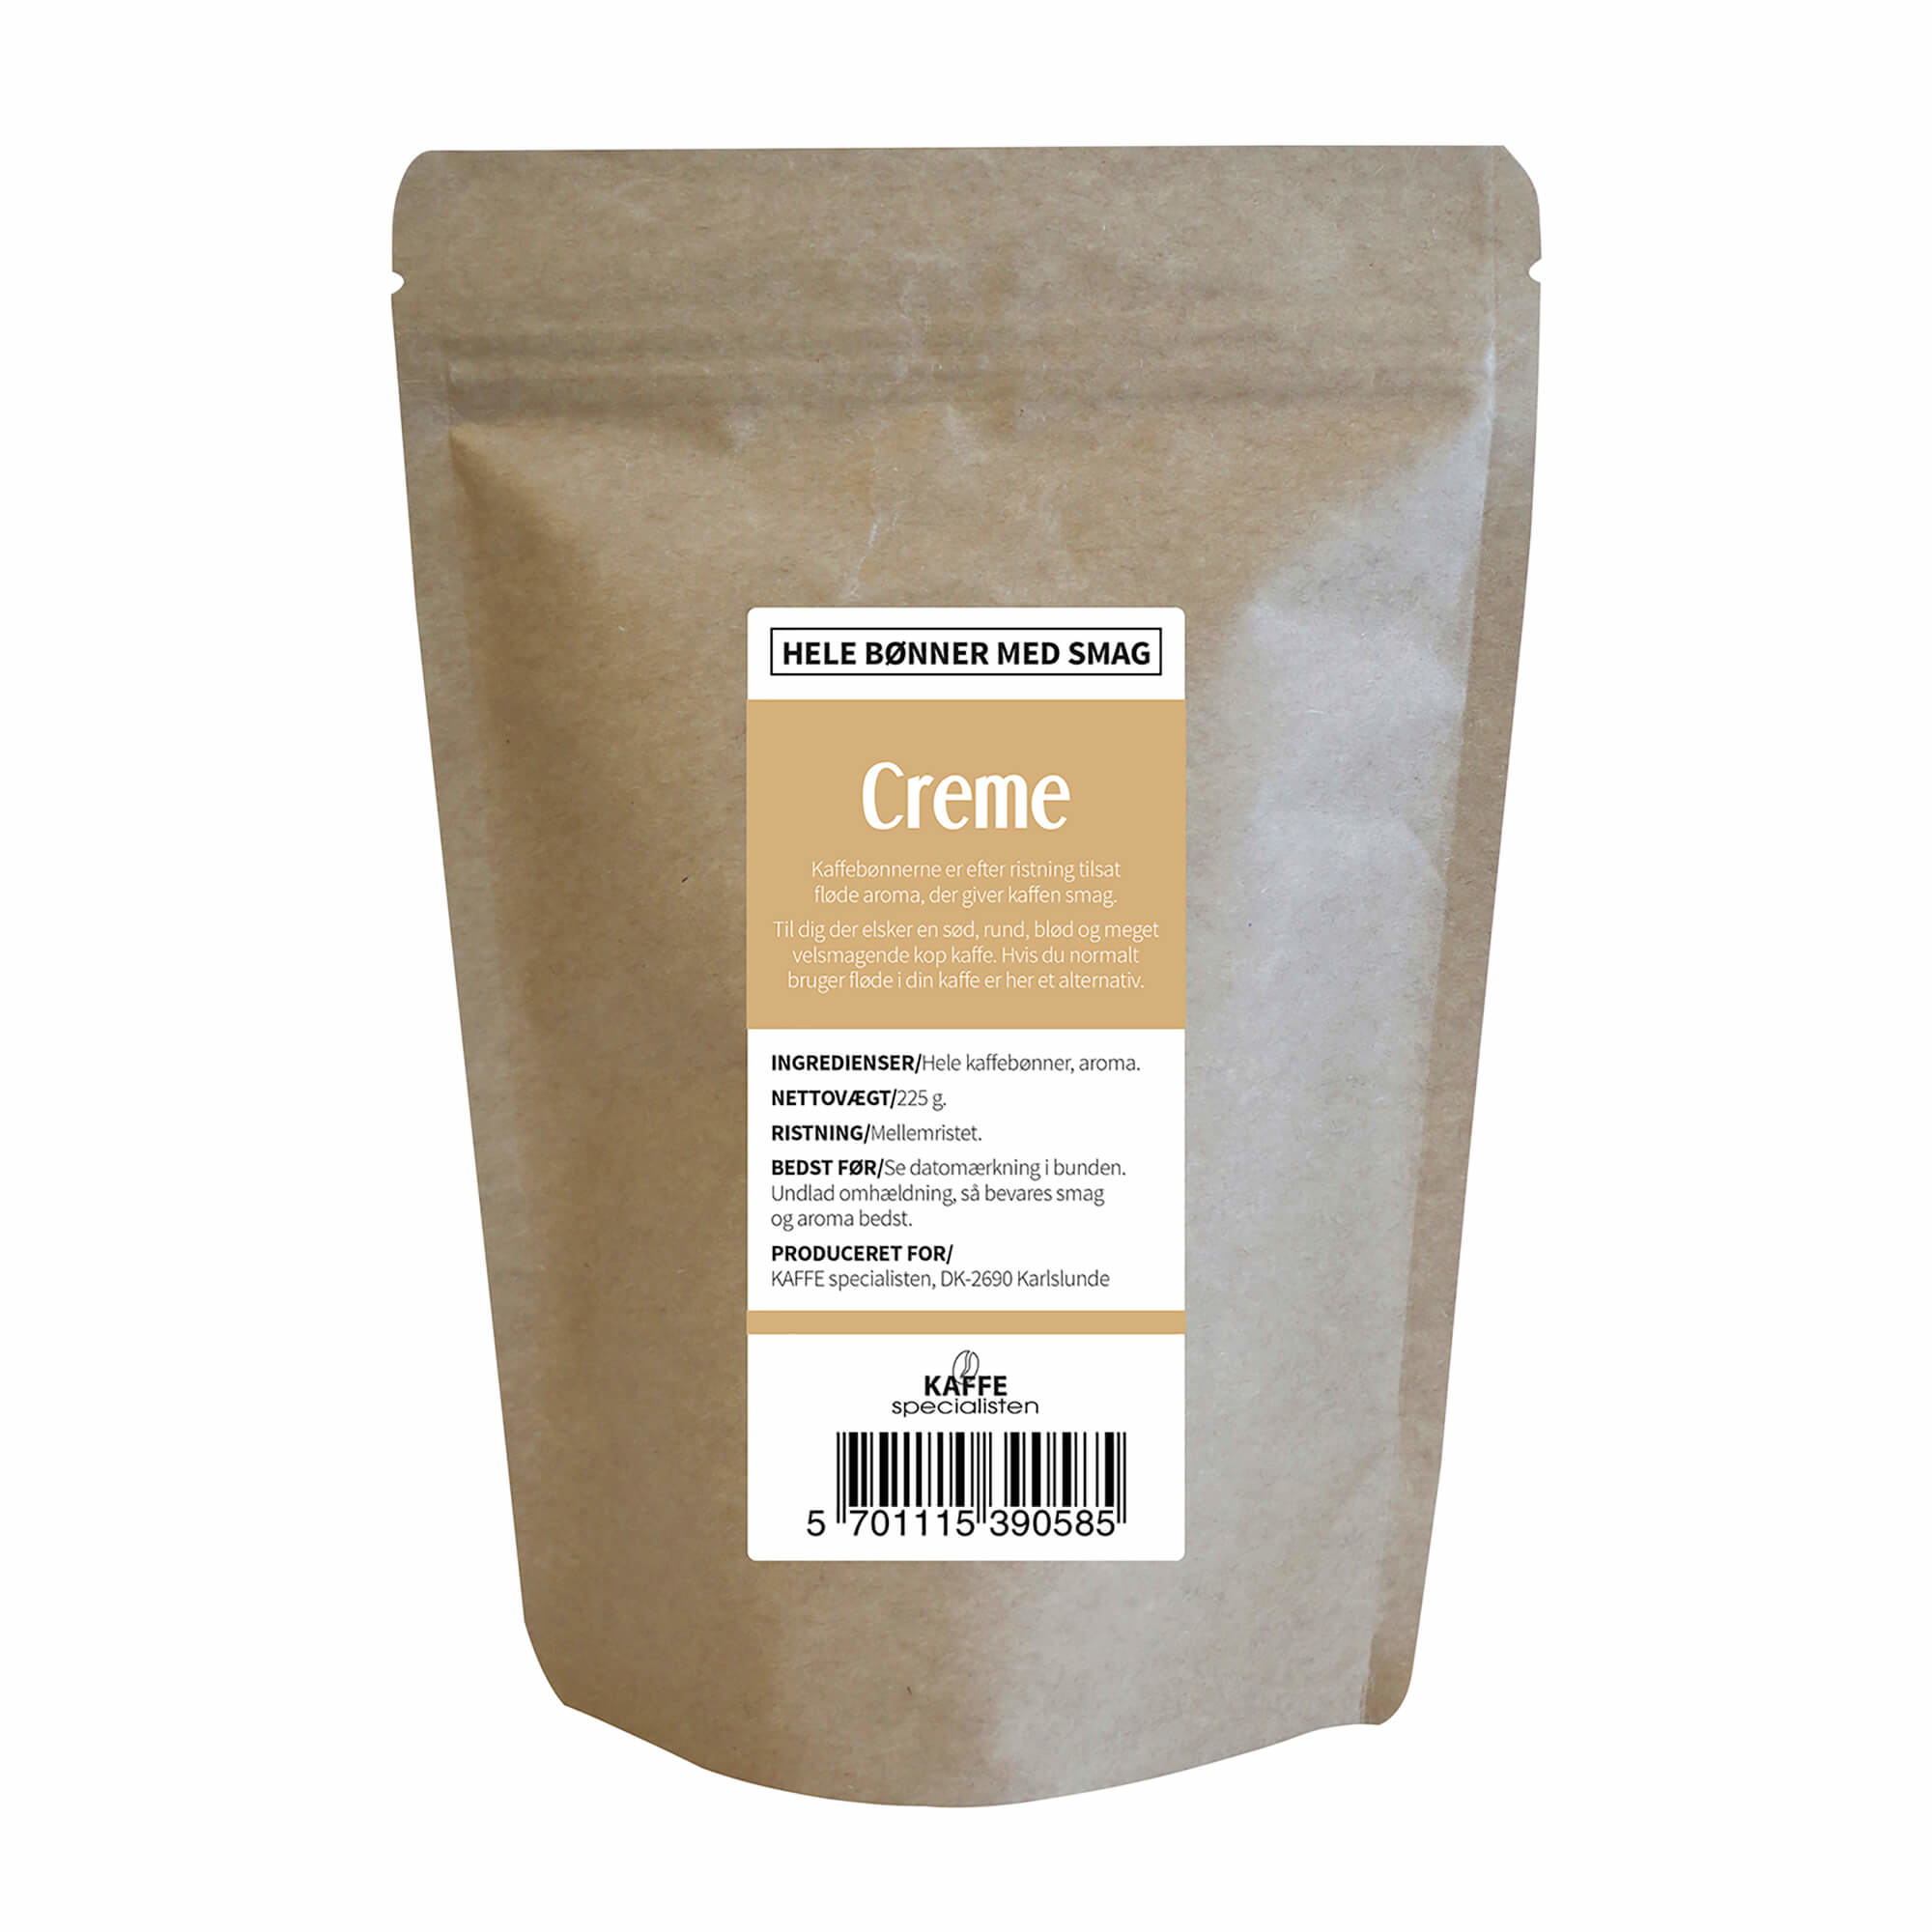 KAFFE Specialisten Kaffebønner Creme Smag